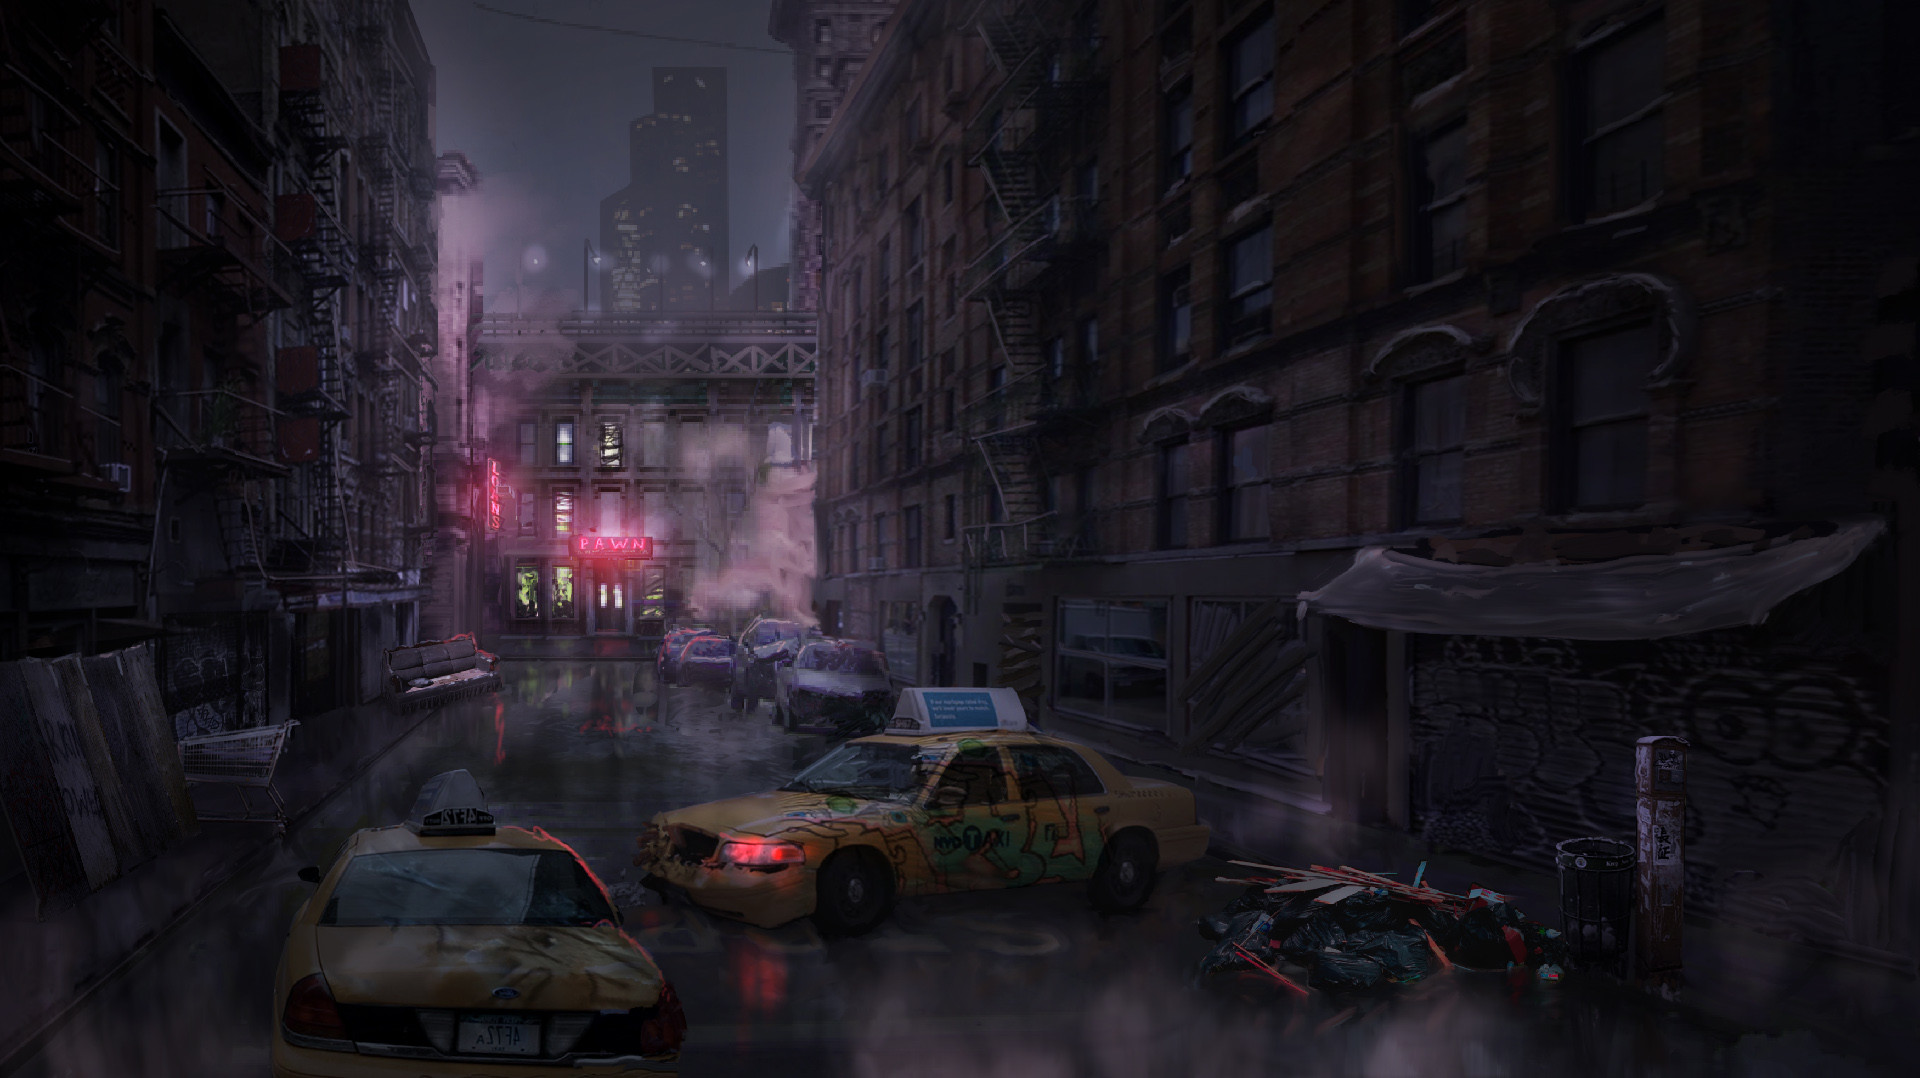 Jack eaves street concept 02